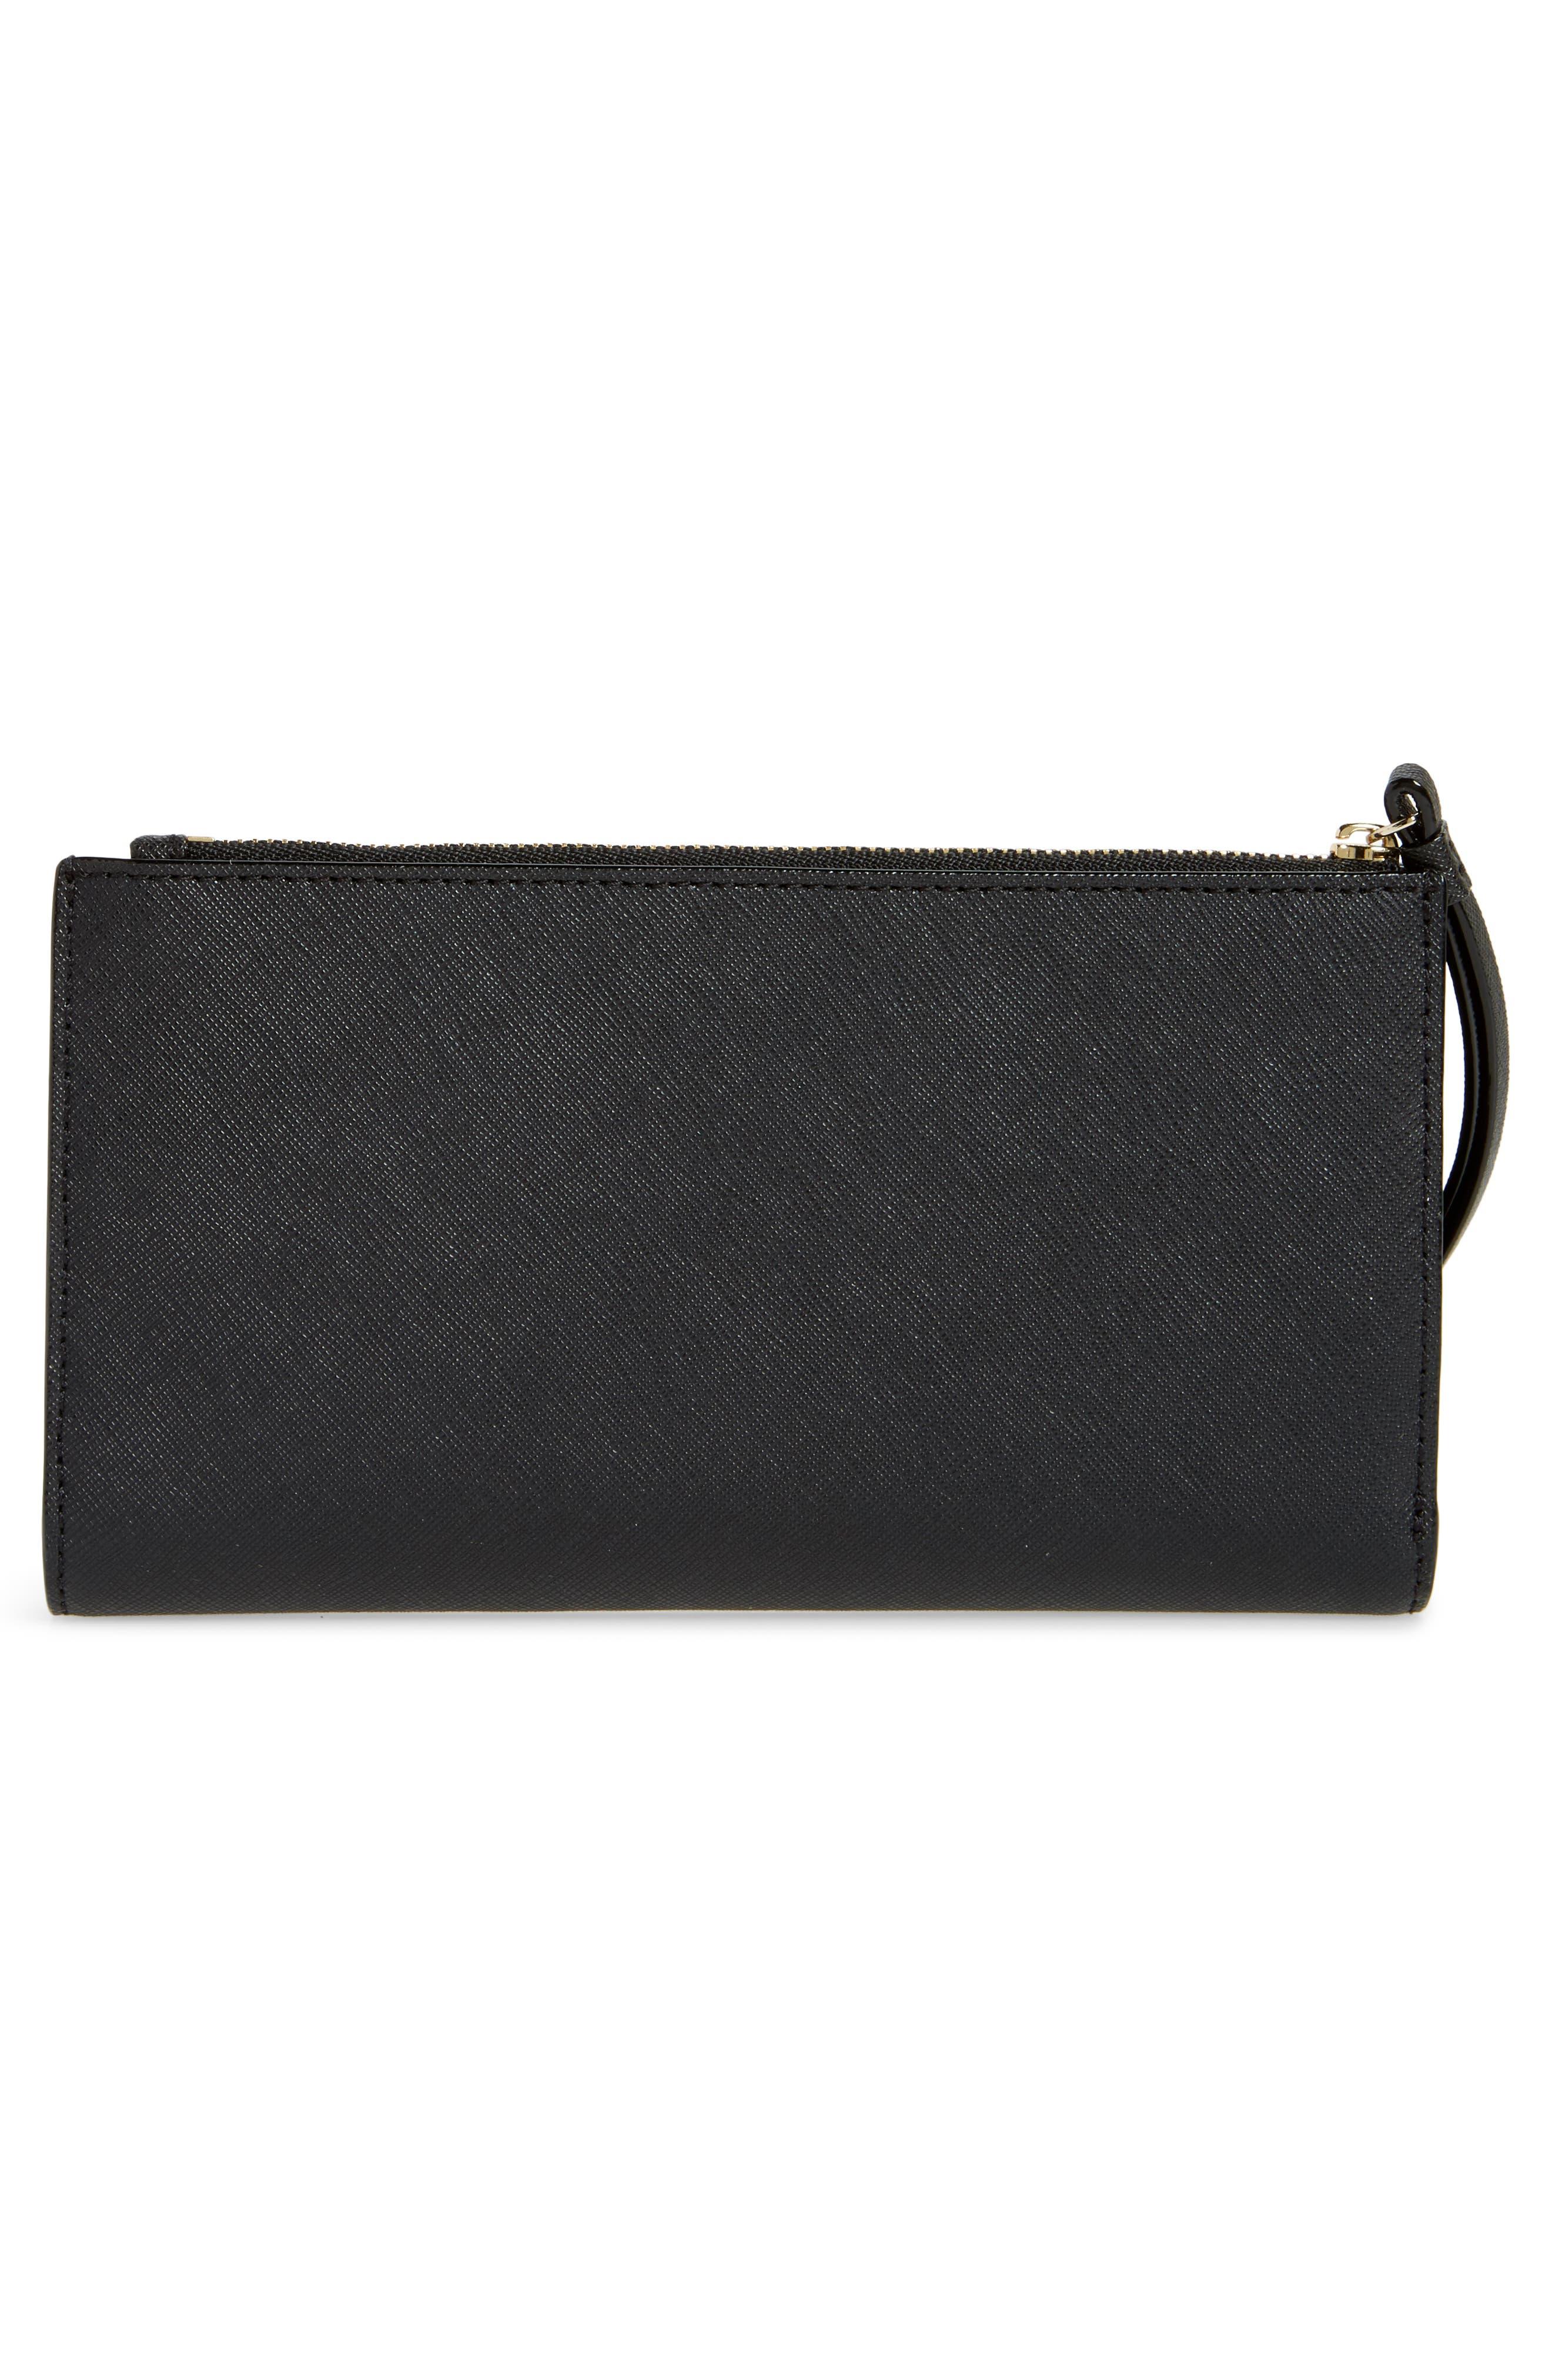 cameron street - eliza leather wallet,                             Alternate thumbnail 3, color,                             BLACK